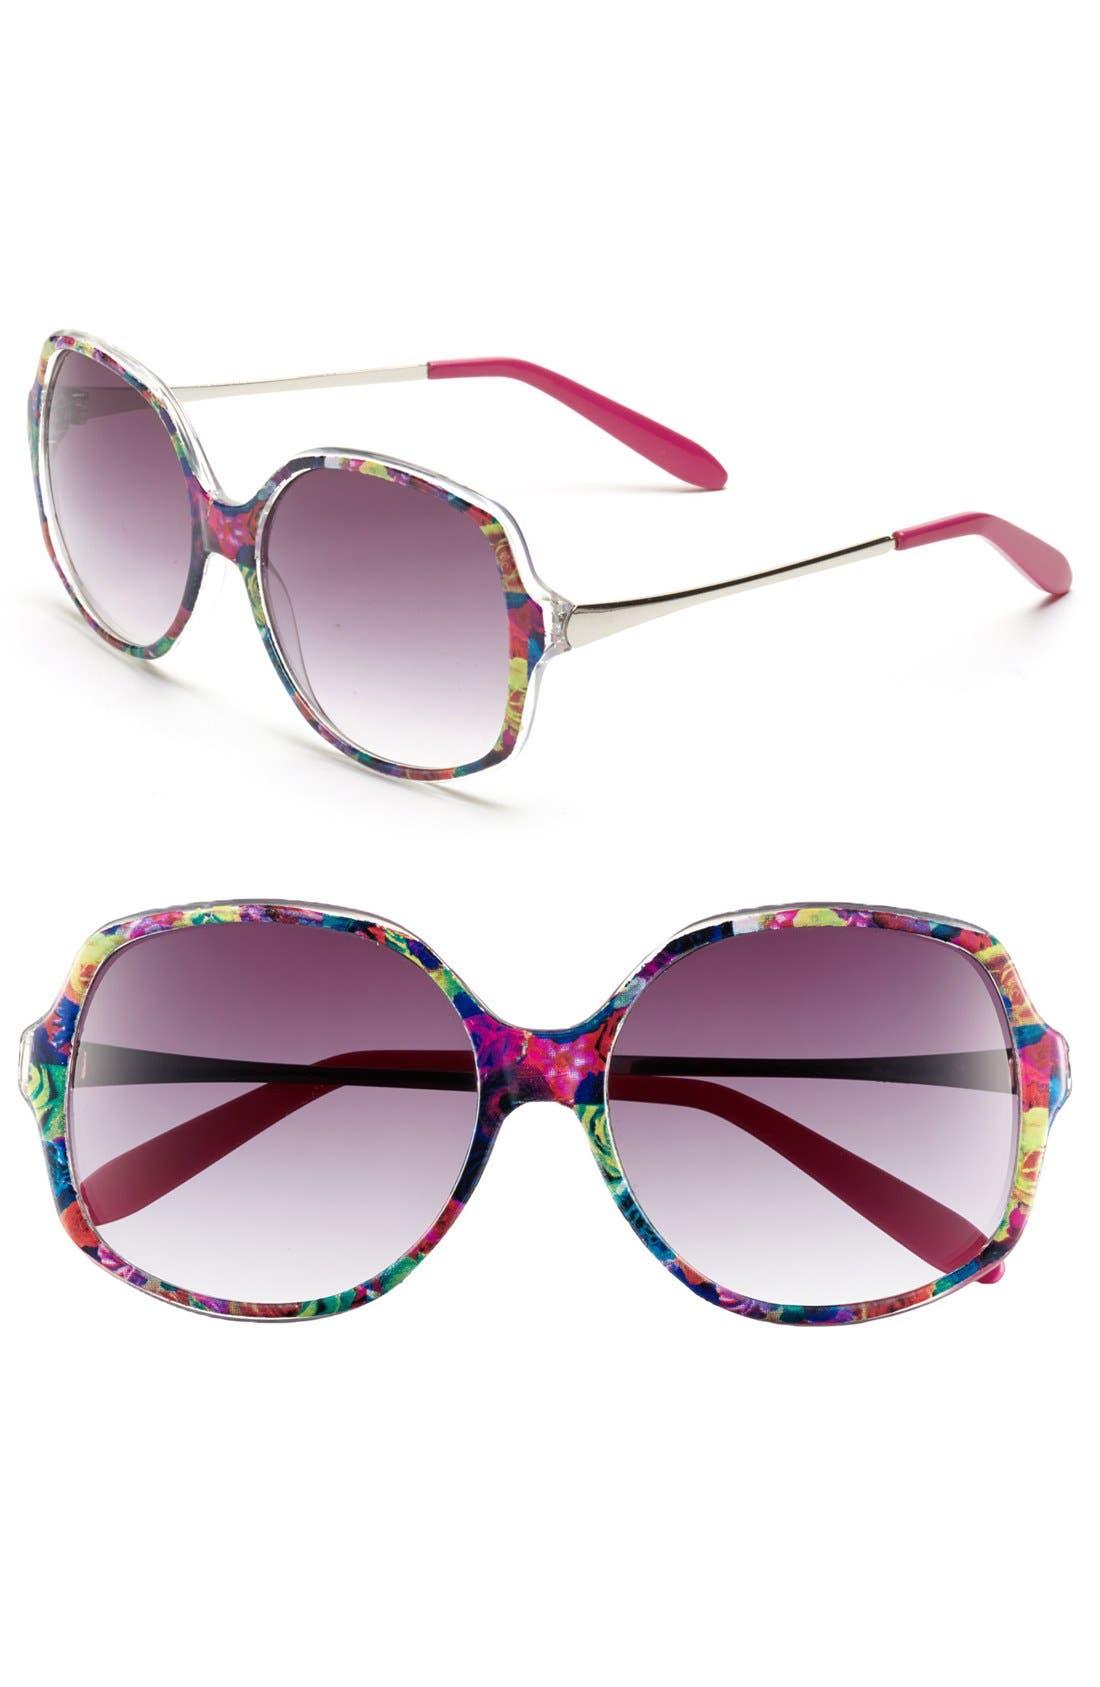 Main Image - Outlook Eyewear 'Point' 57mm Sunglasses